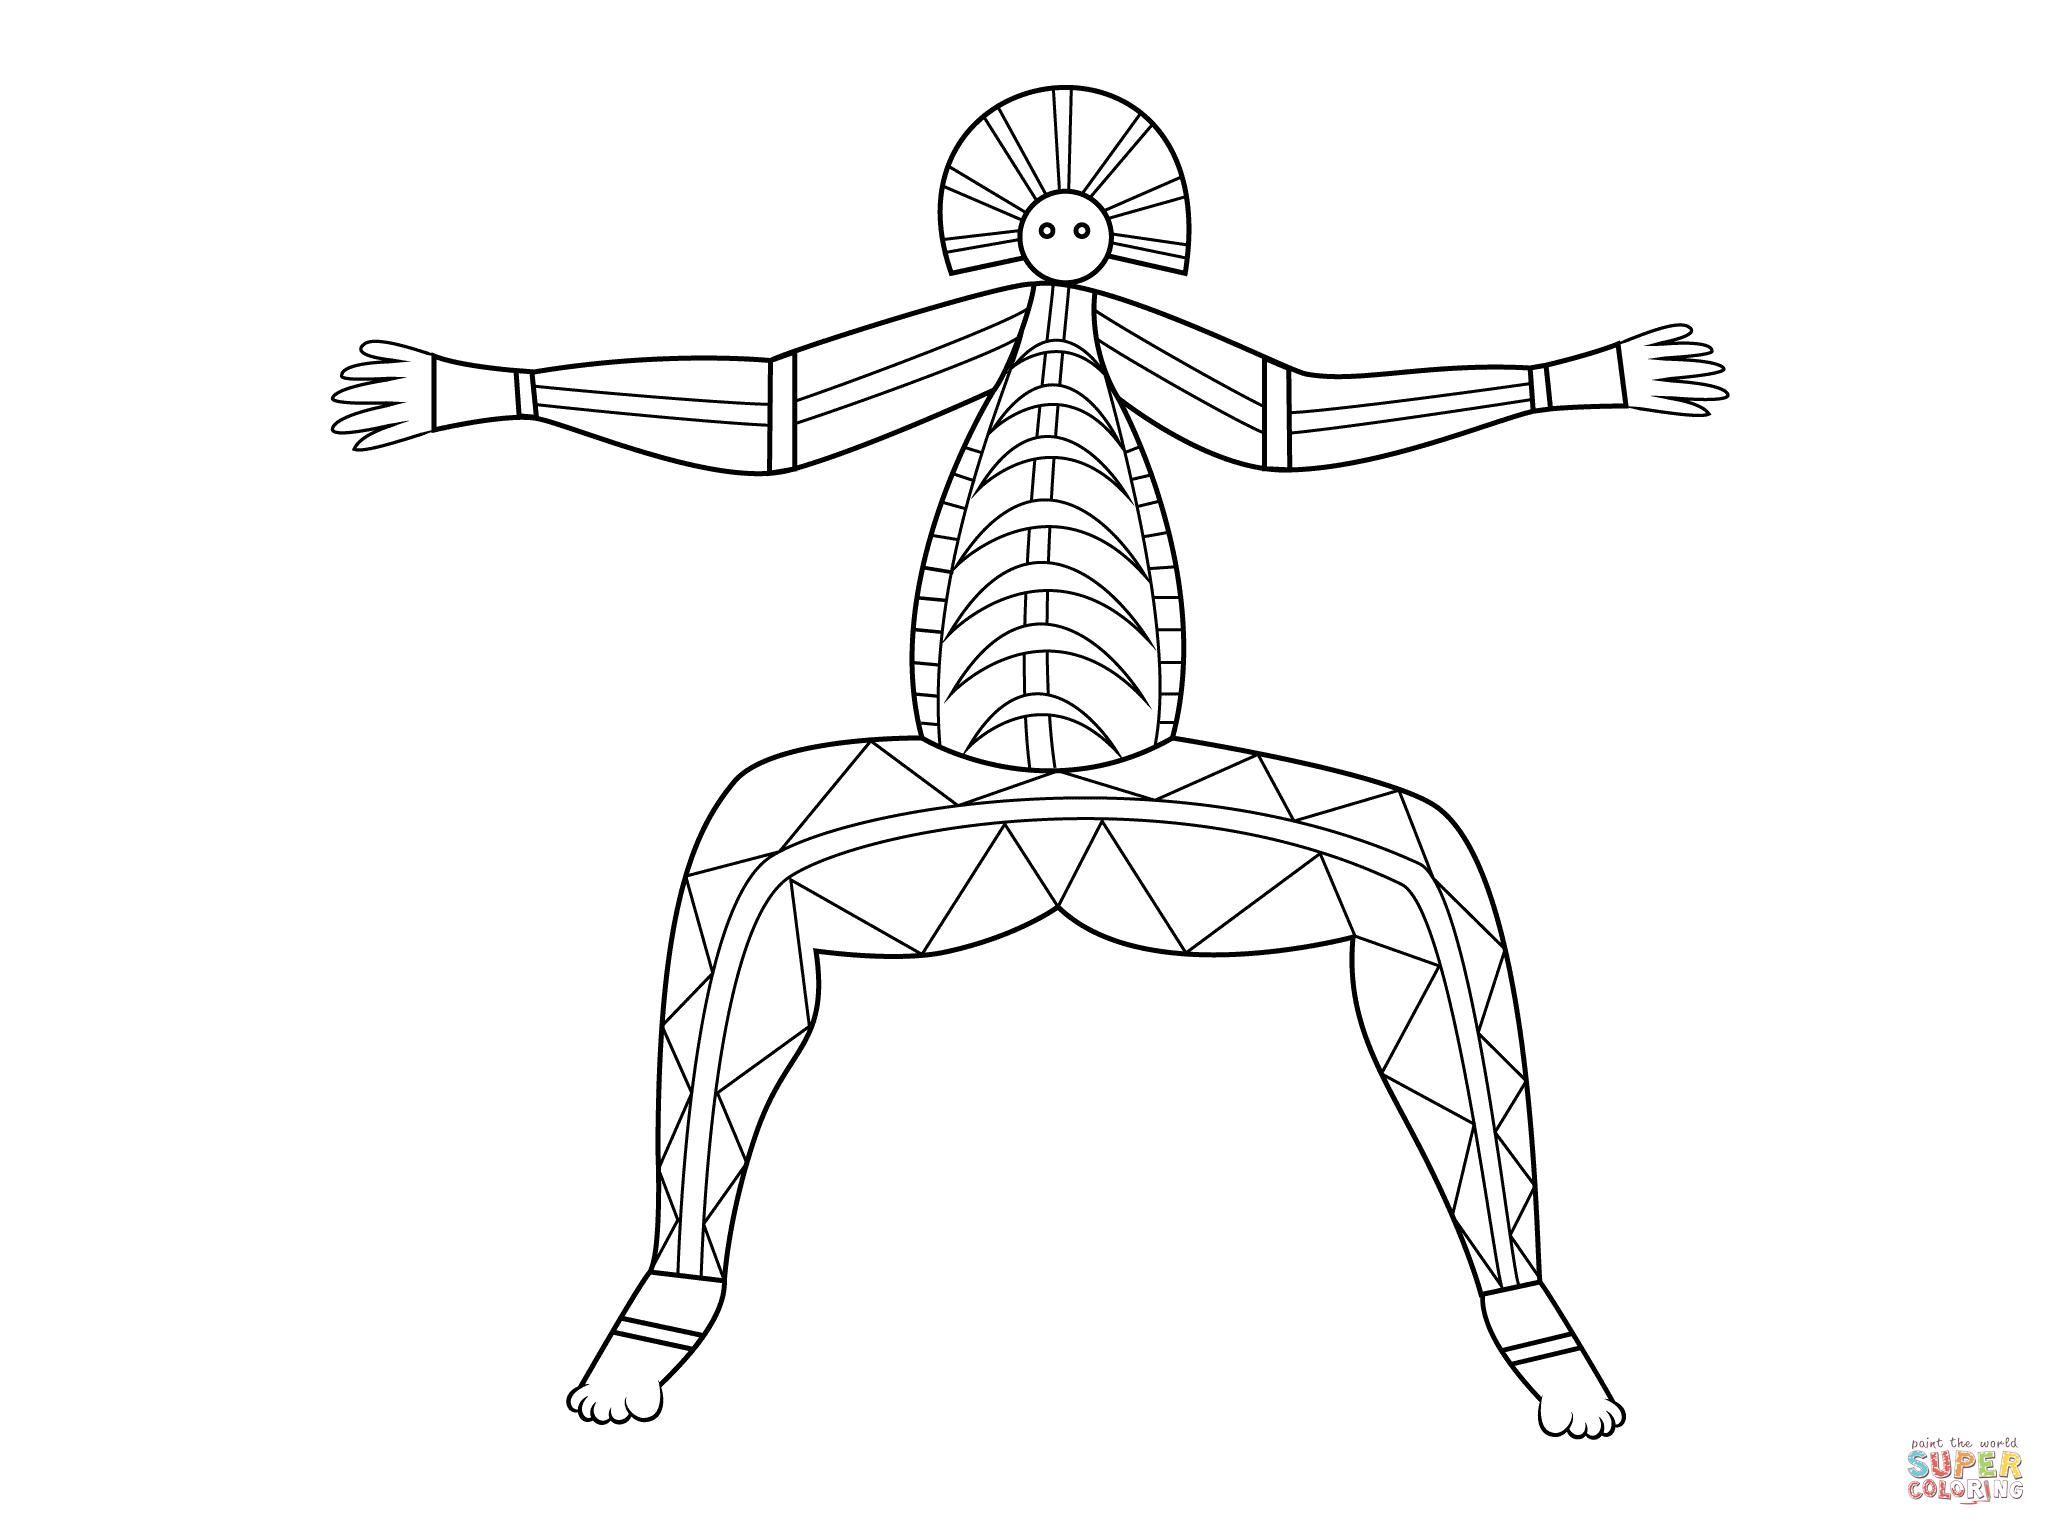 Aboriginal Panting Of Mythological Figure Coloring Page